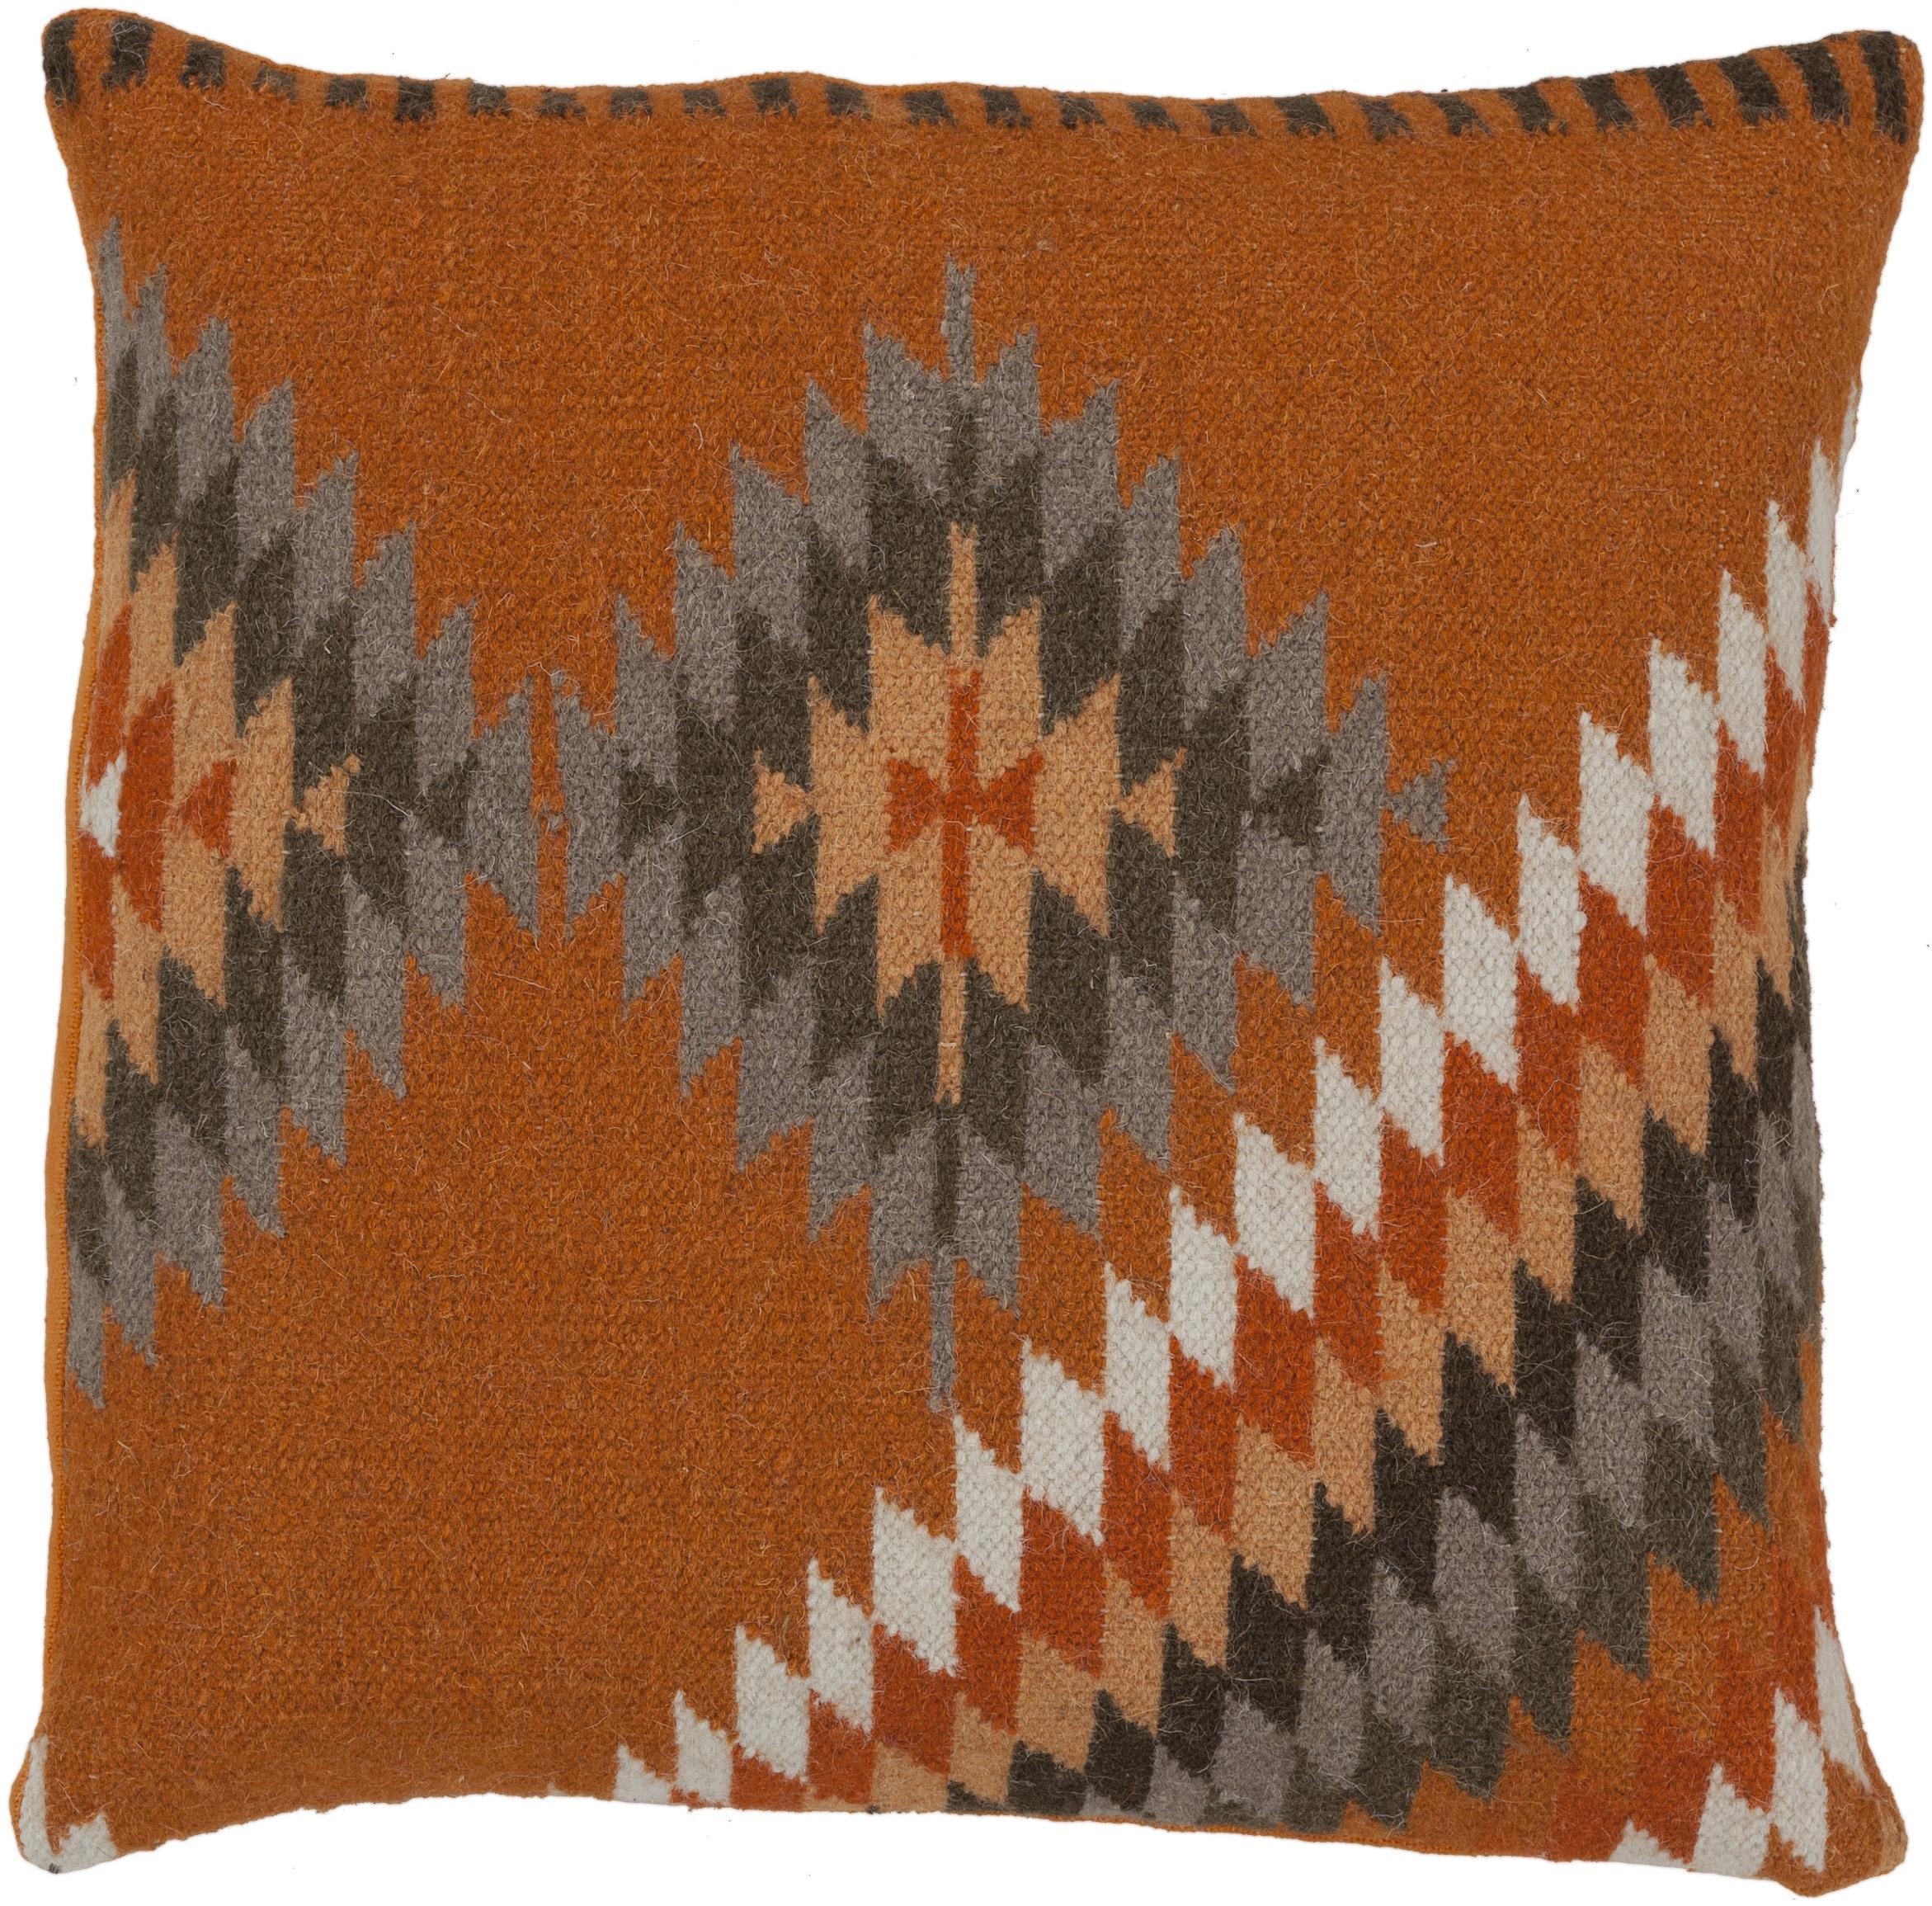 "Pillows 22"" x 22"" Pillow by Surya at Suburban Furniture"